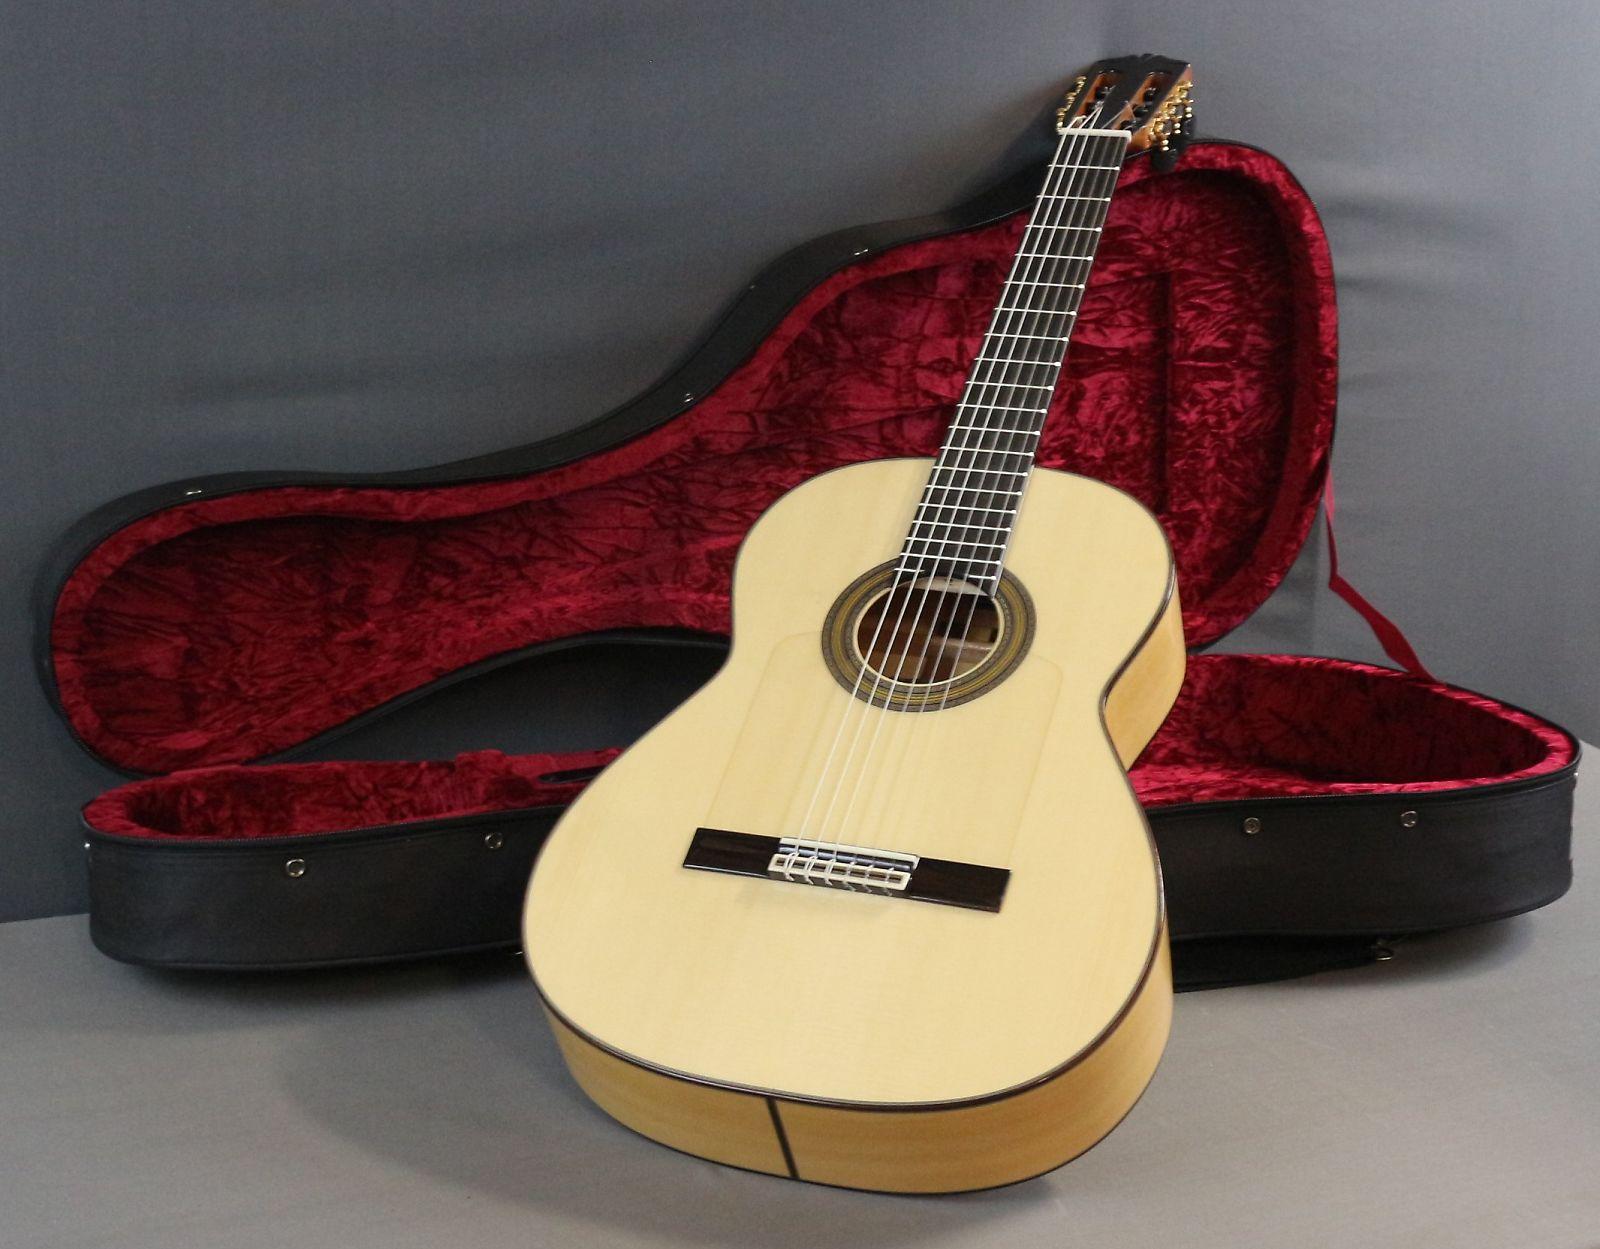 9c9376d74f Cordoba Espana Series Solista Flamenca Acoustic Classical Guitar w/Ploy Foam  Case